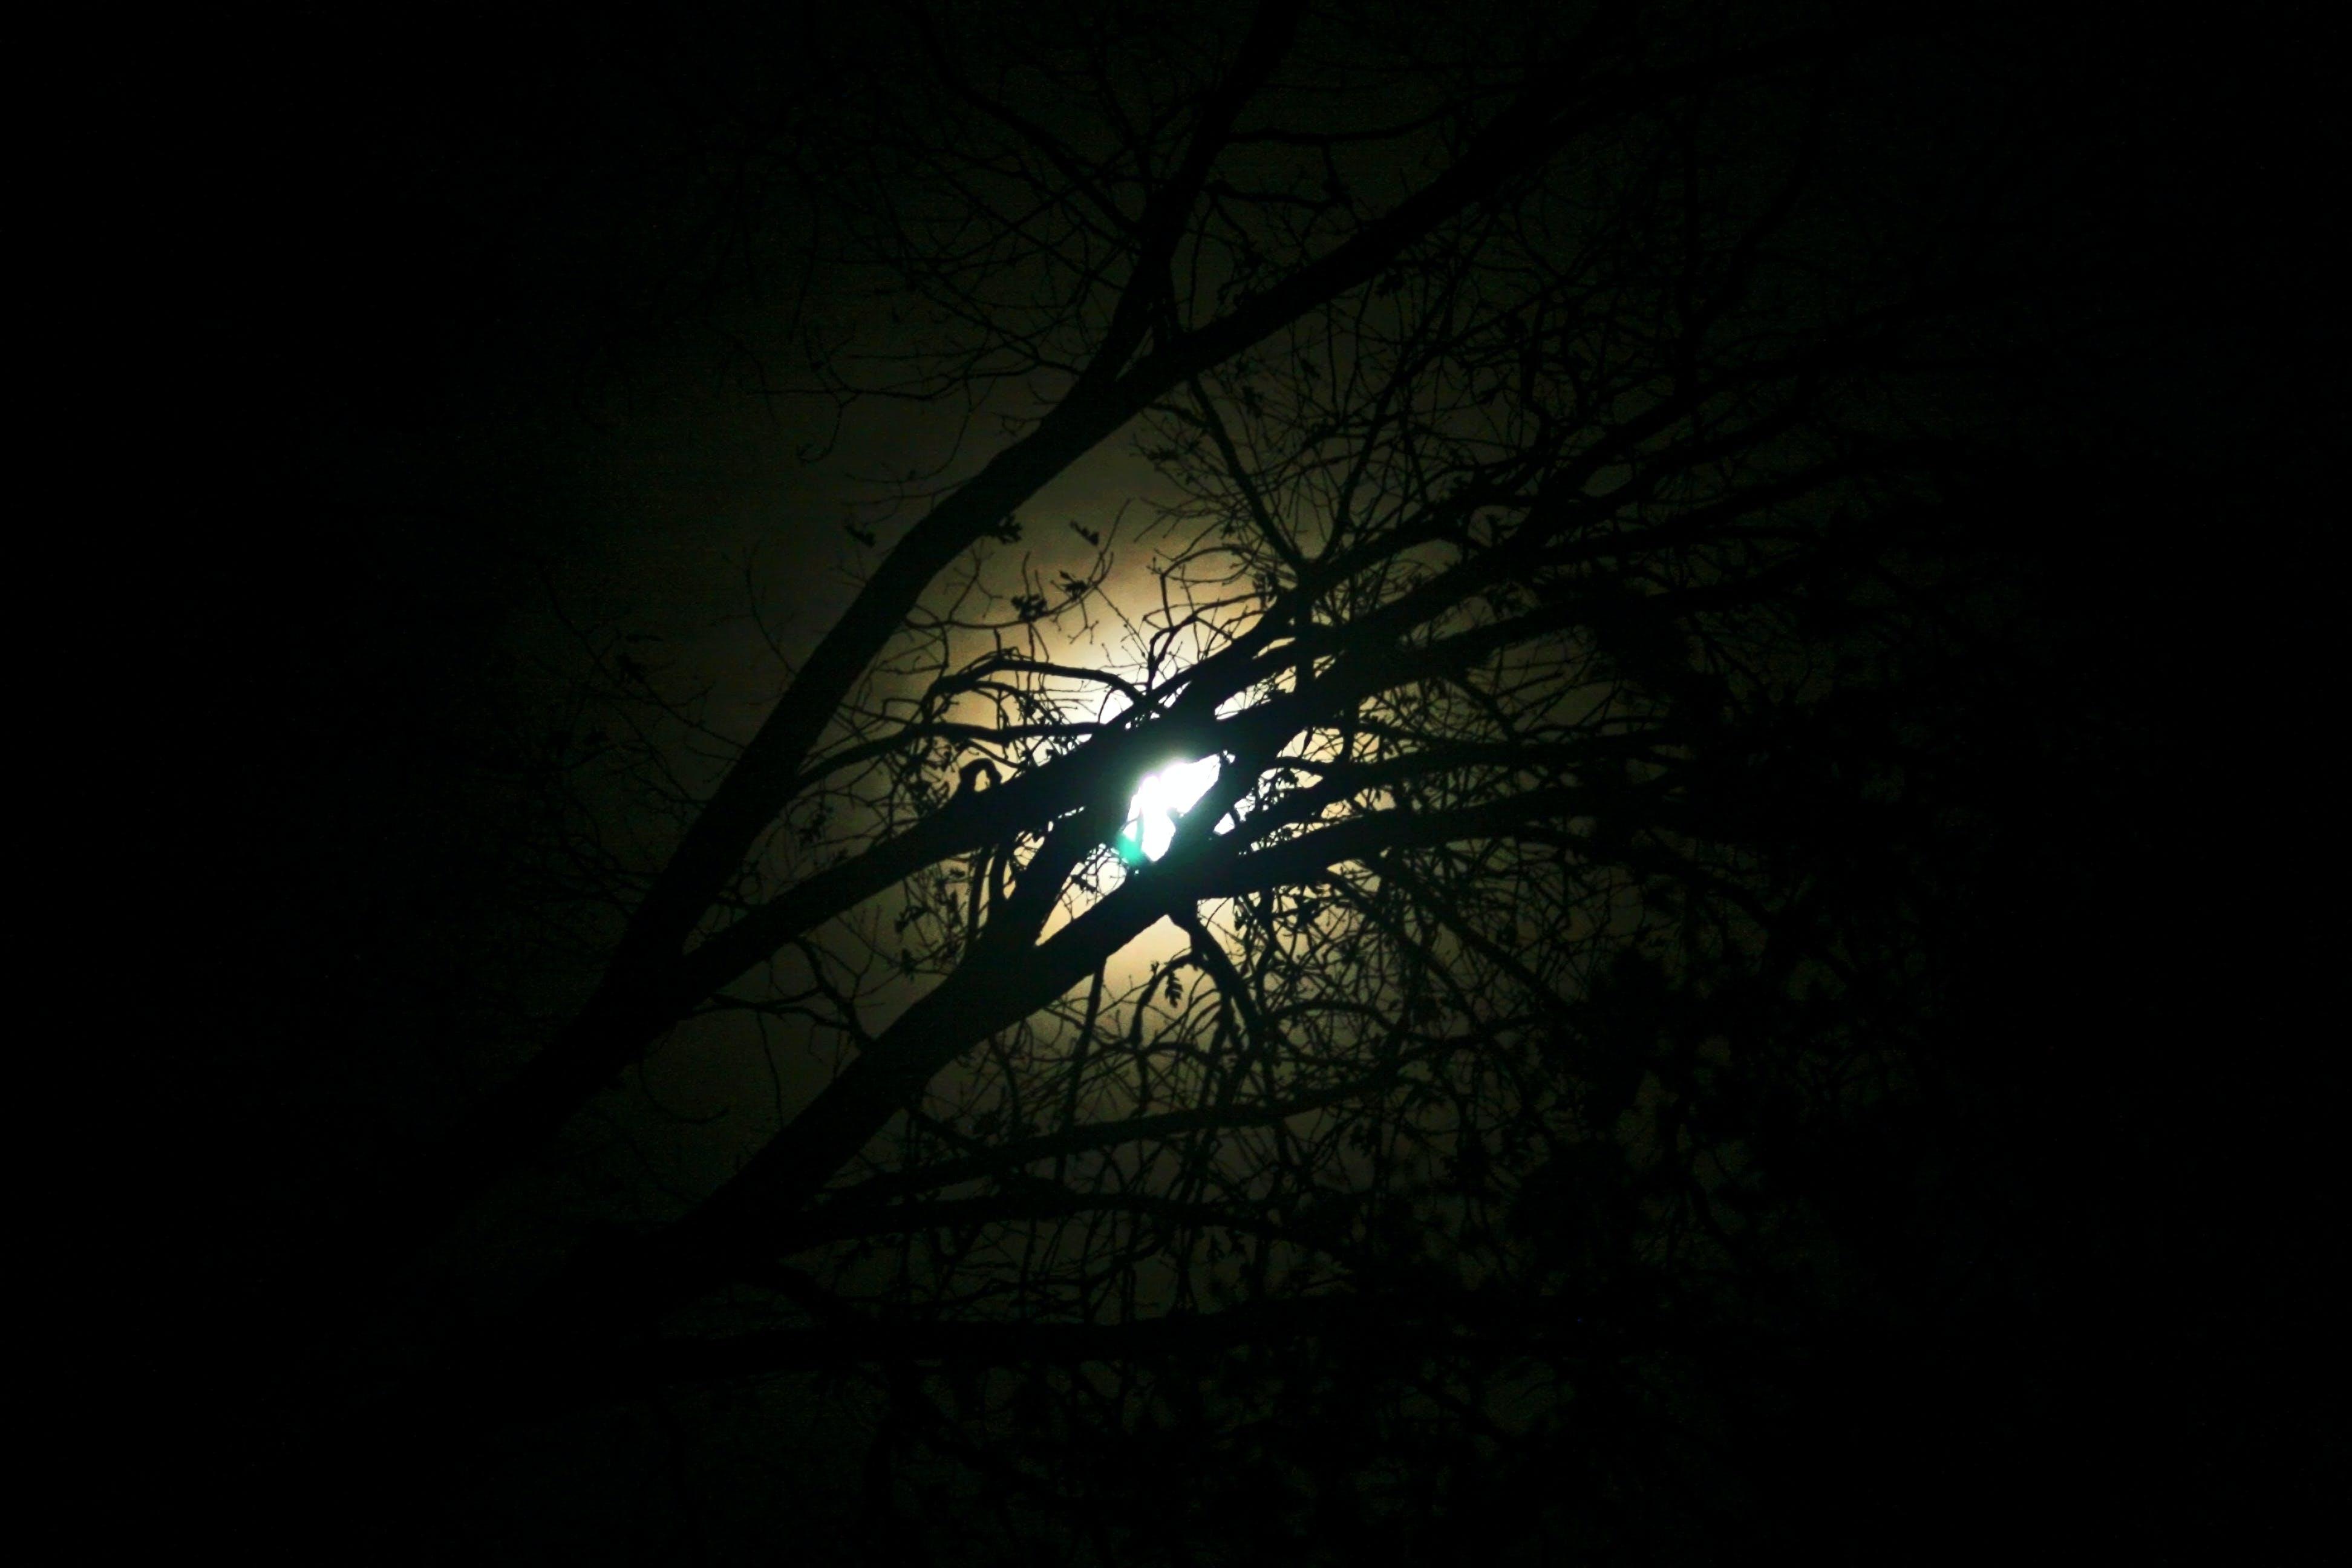 Free stock photo of camping, full moon, moonlight, trees